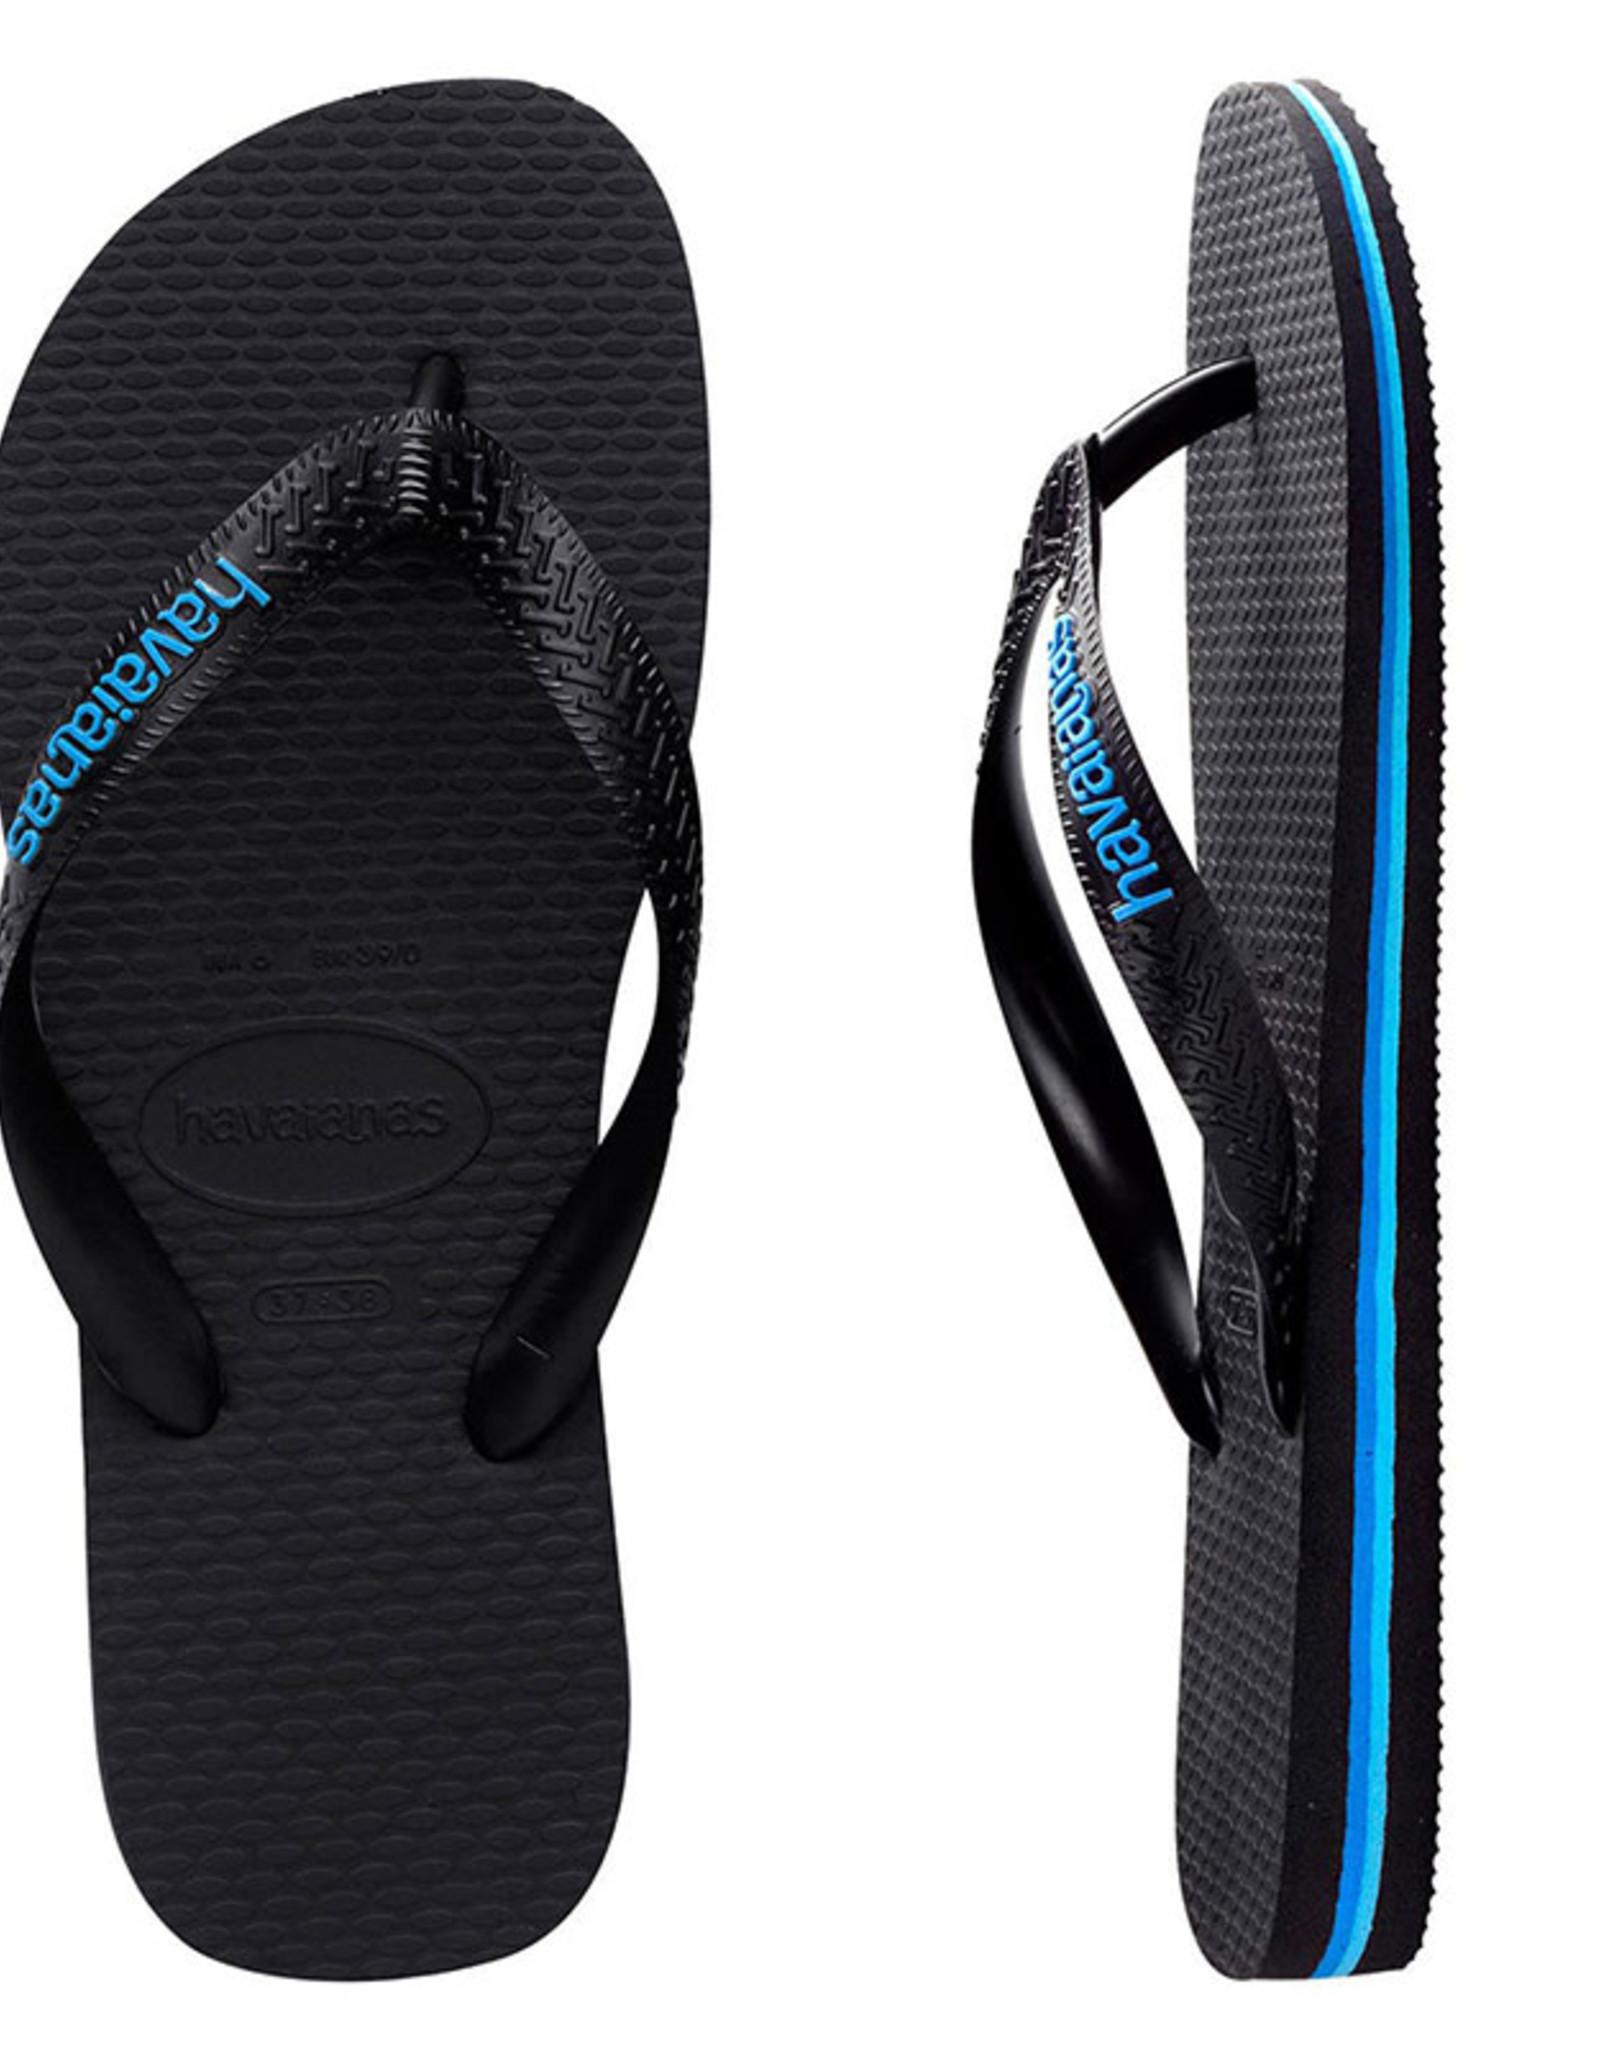 HAVAIANAS Rubber Logo Black/Blue Thongs